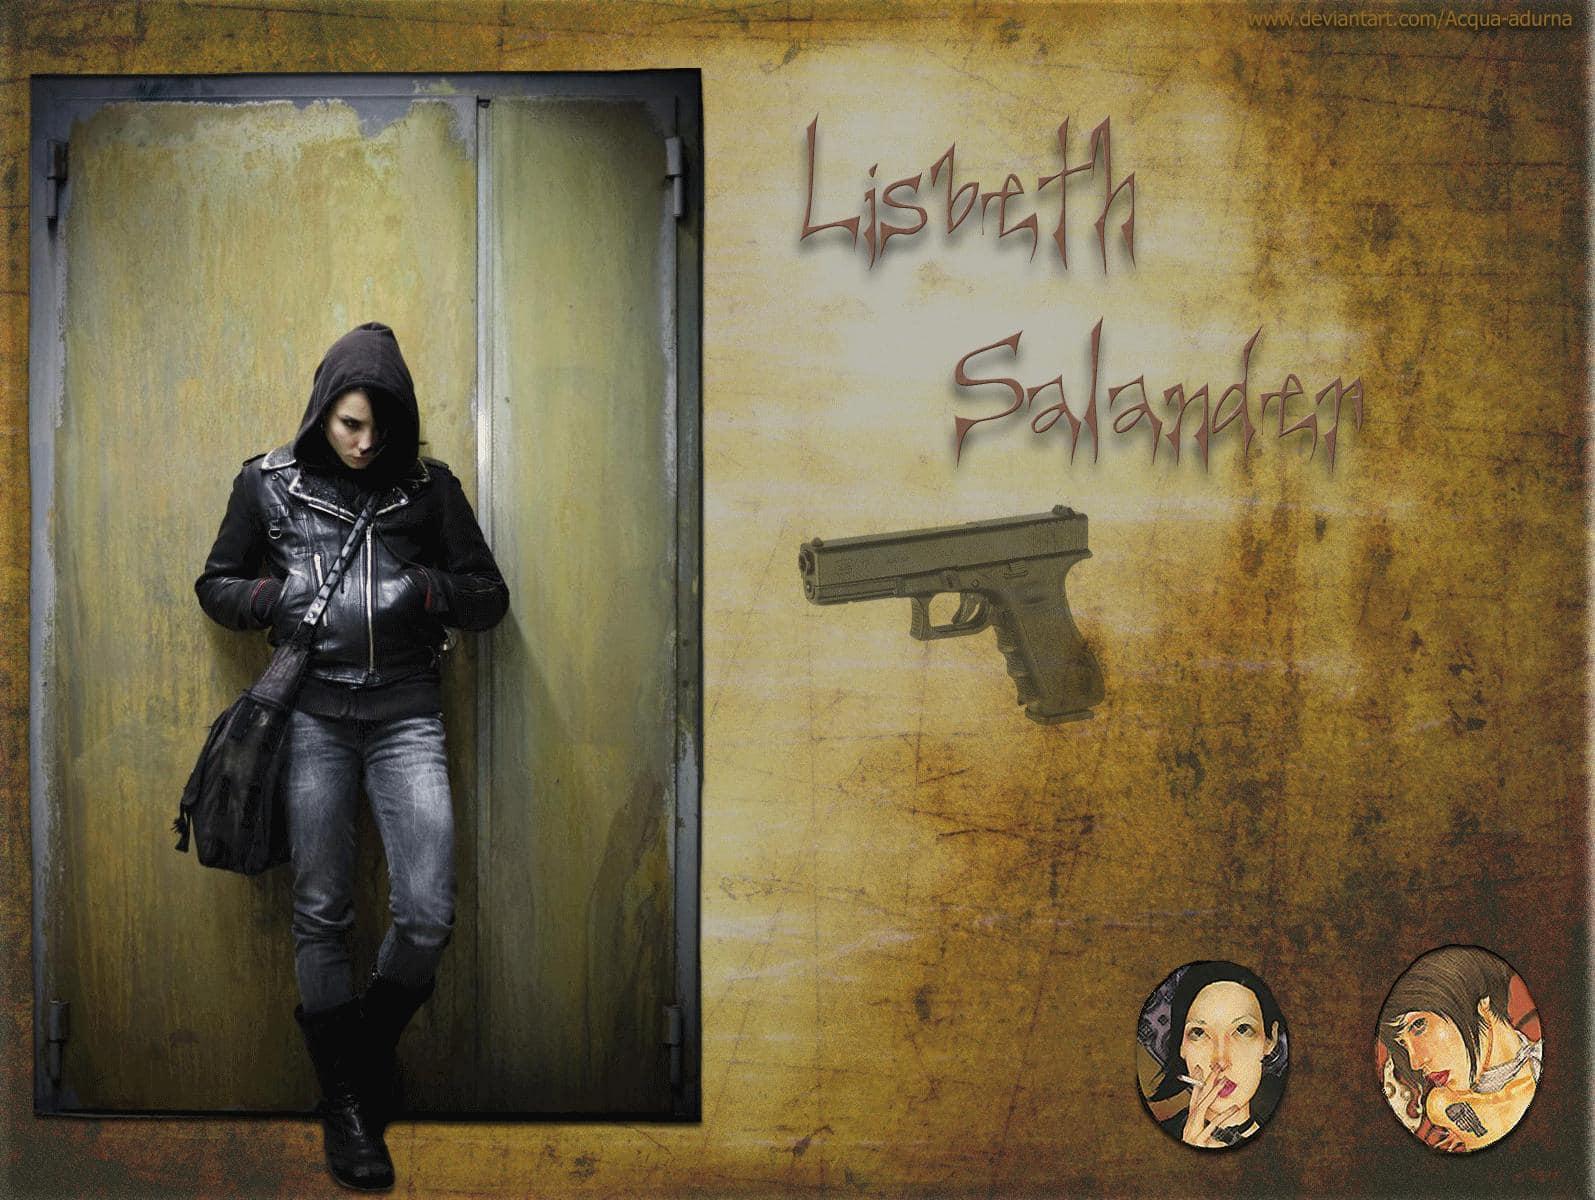 Fondo de Lisbeth Salander (Millenium)